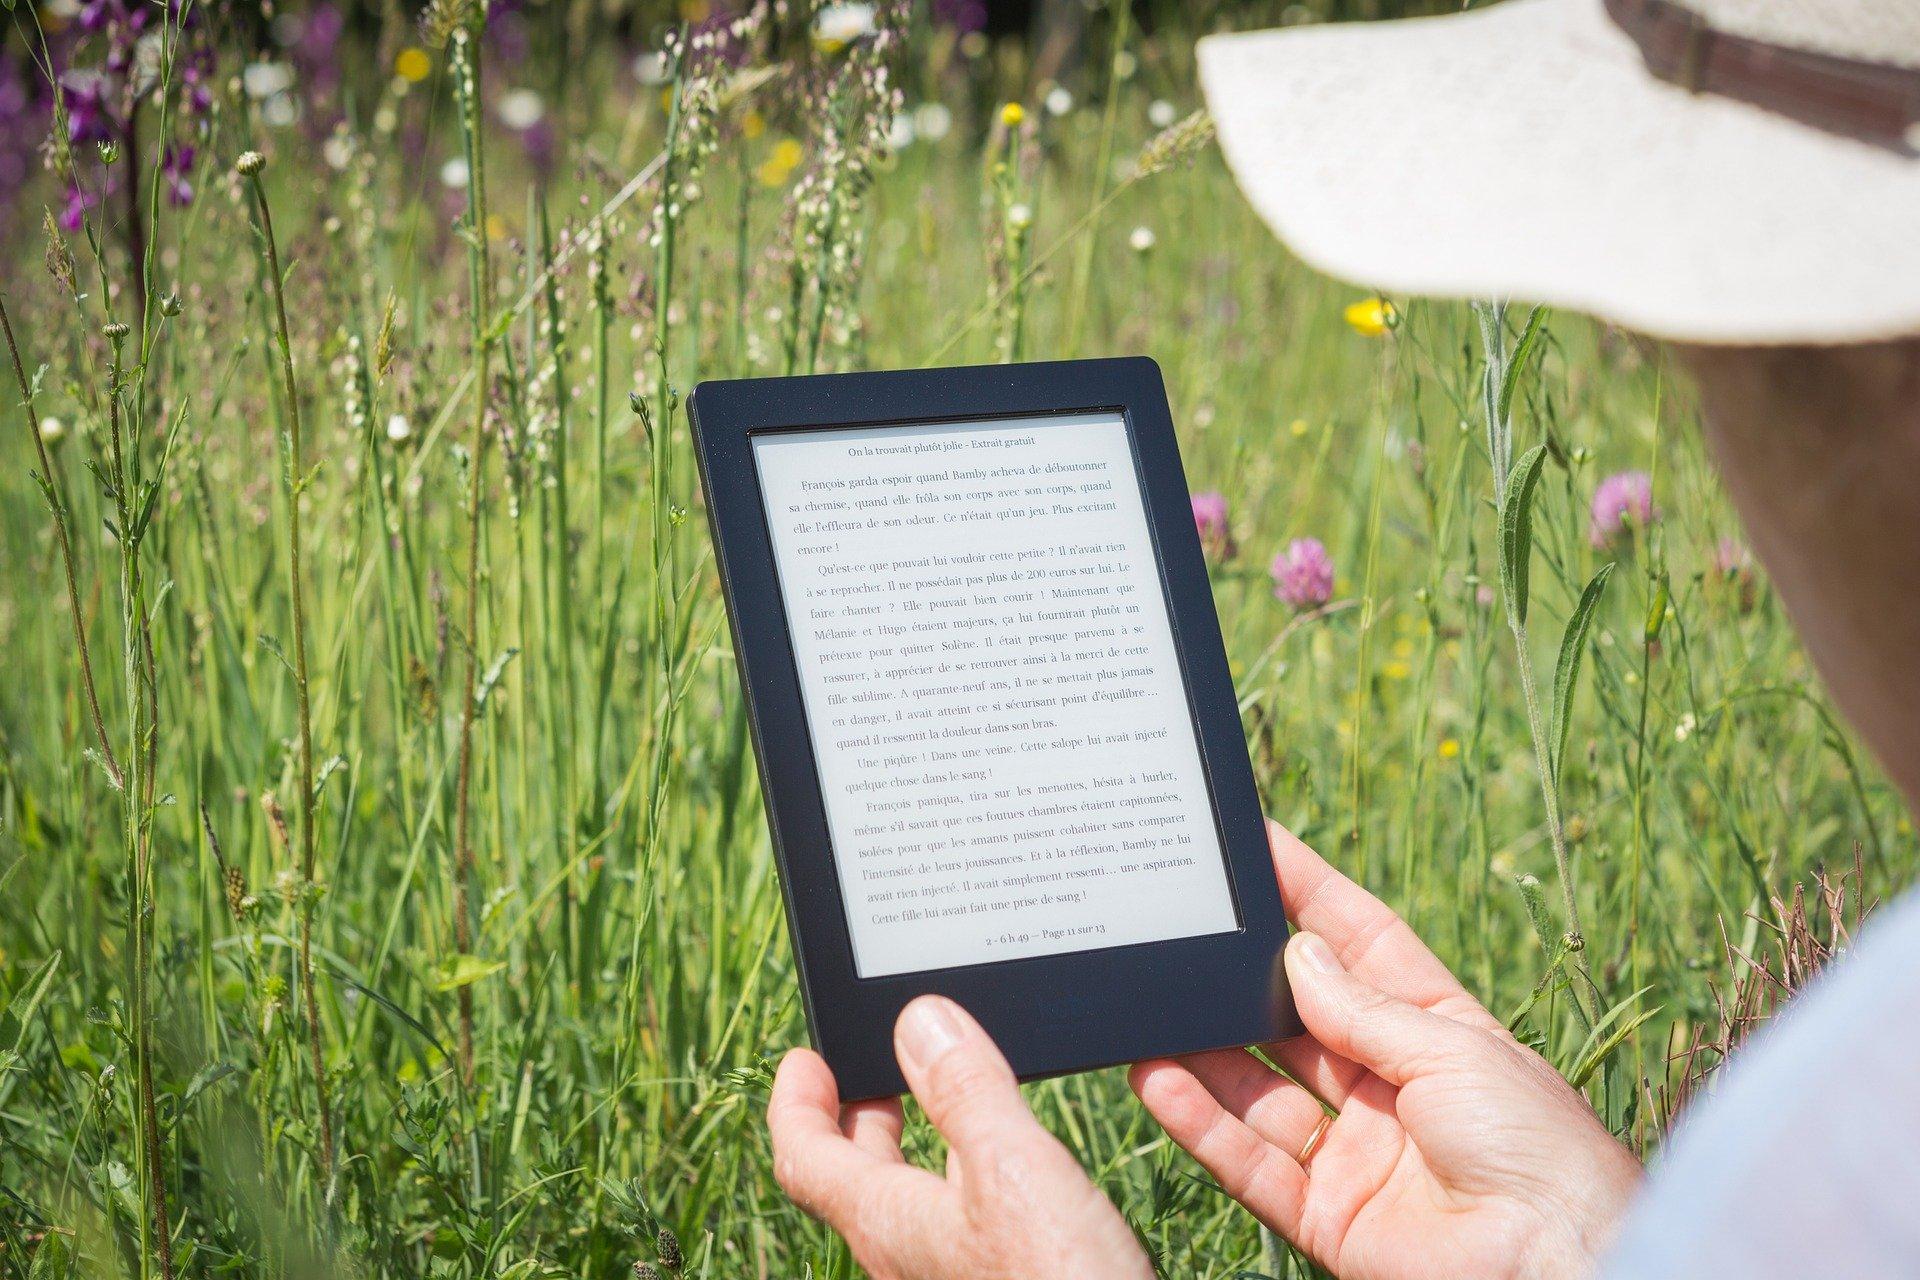 Person using e-reader outdoors